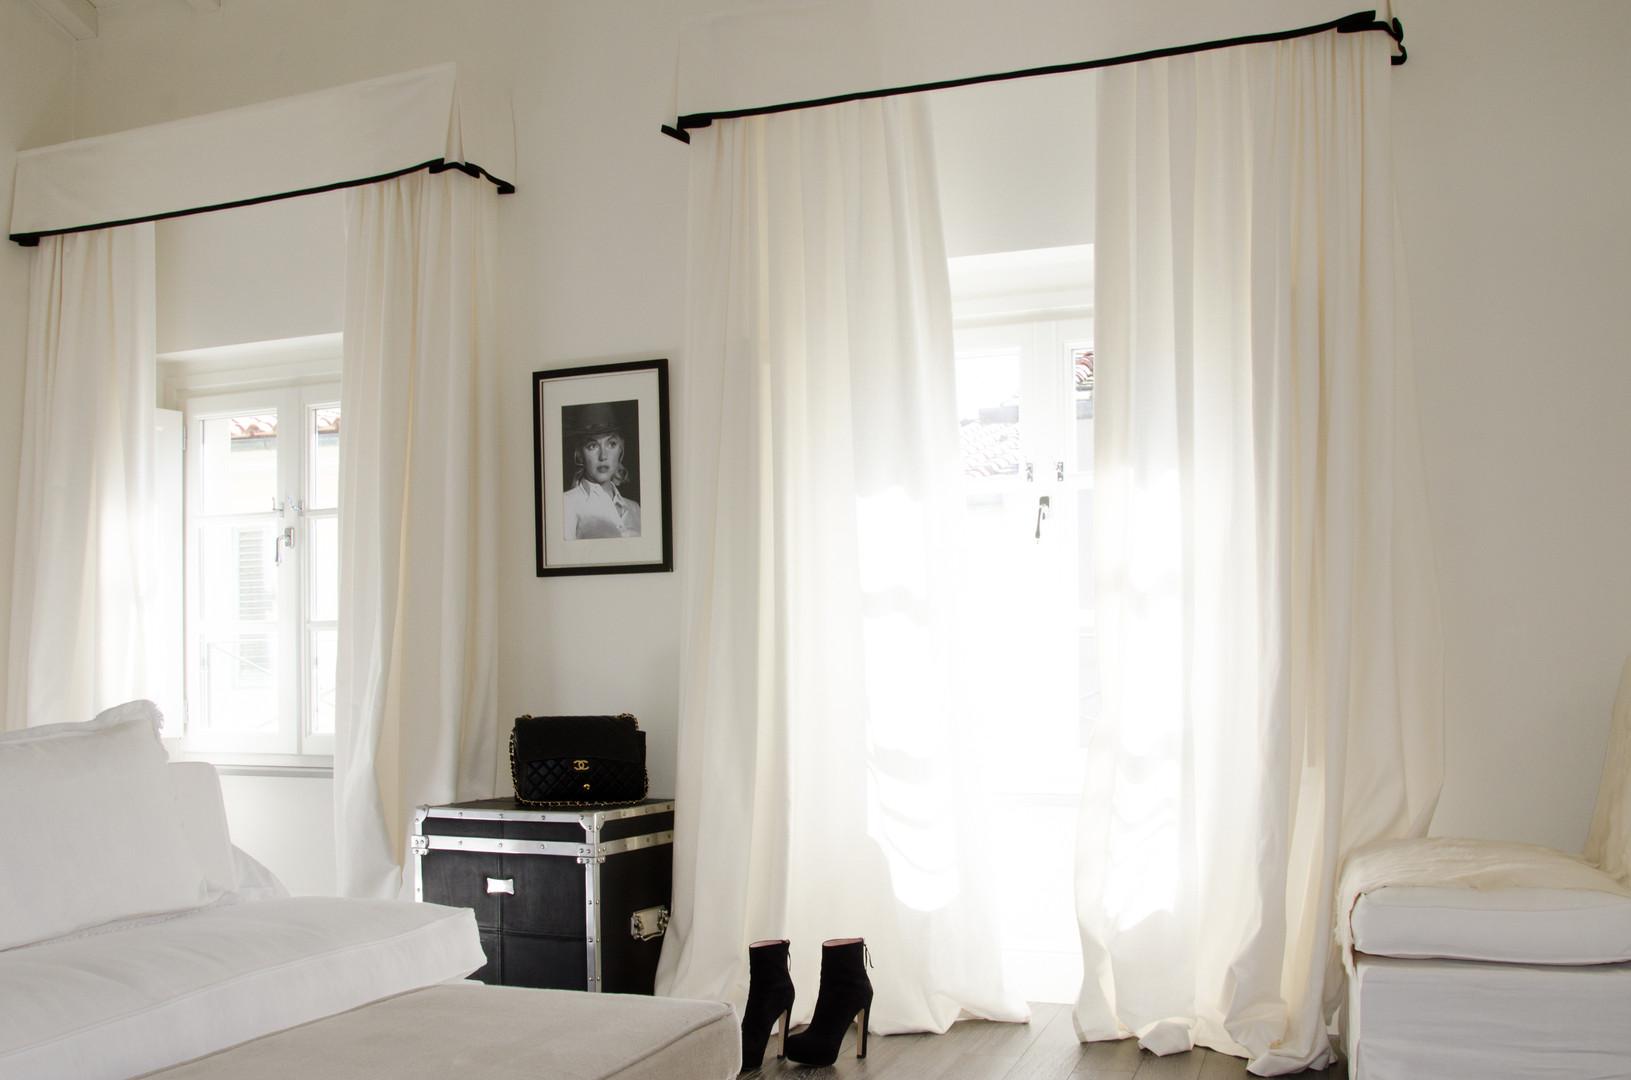 05 B&B Hall- Susanne Paetsch interior photo